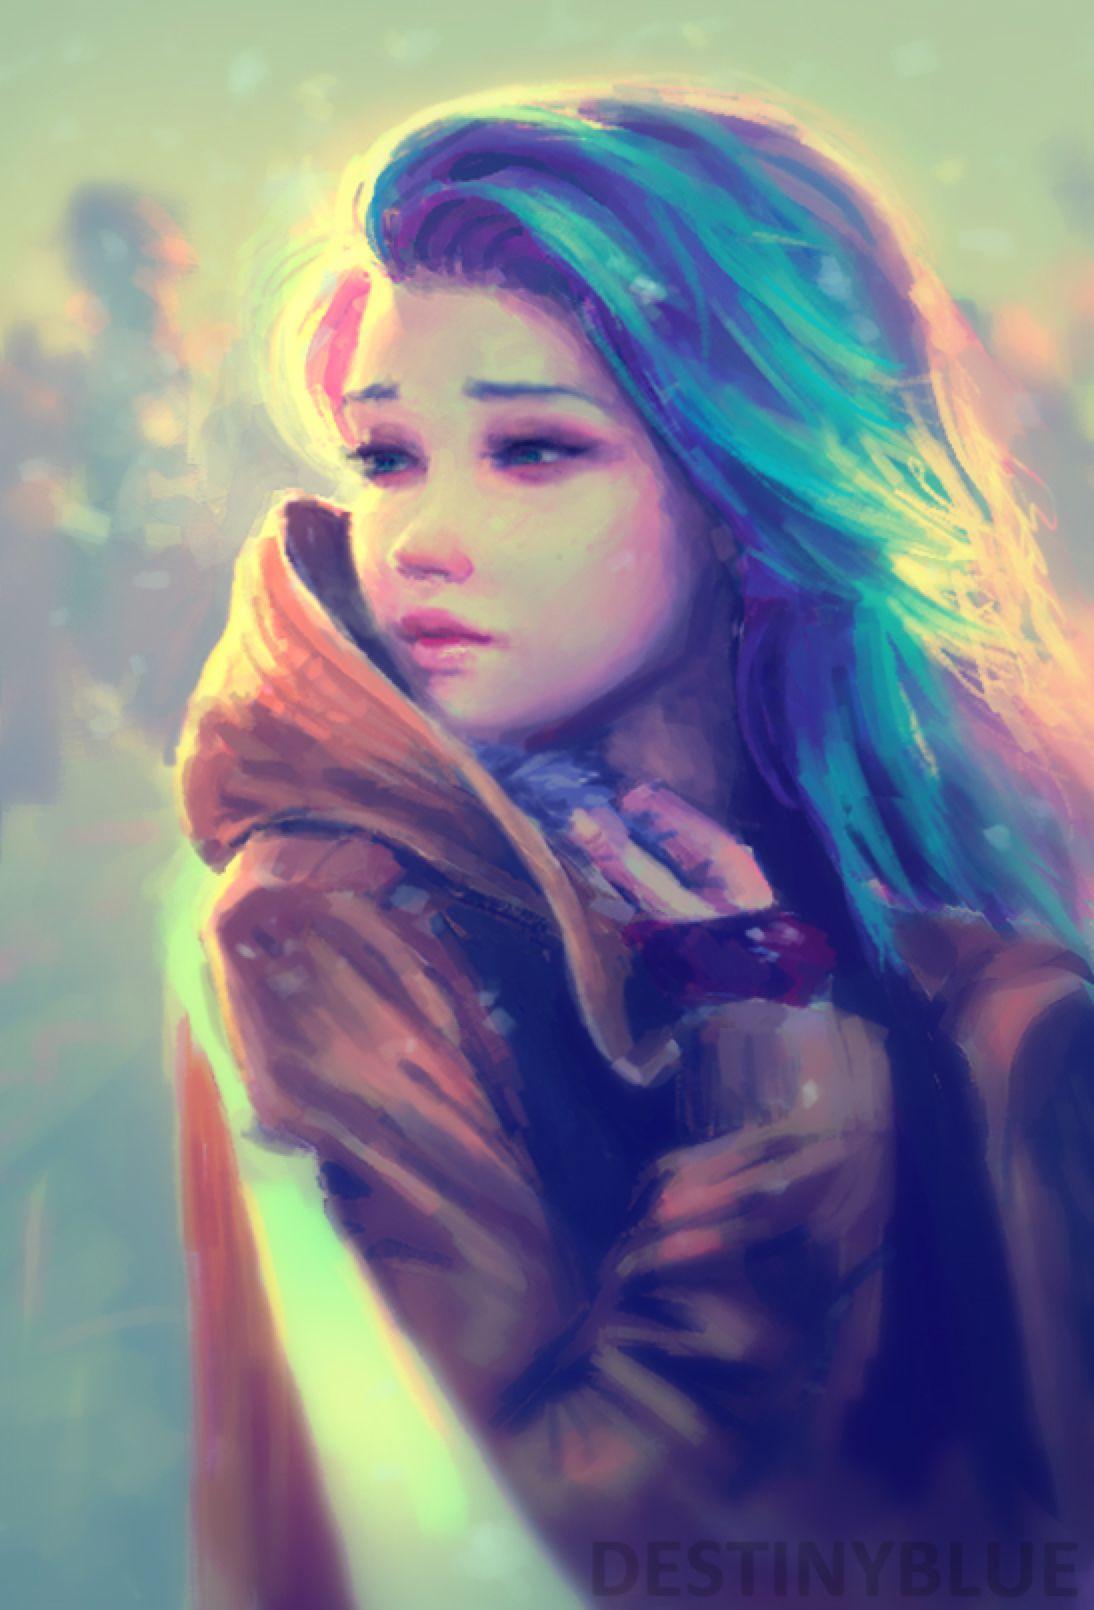 deviantART Digital Art Anime Girl with Blue Hair